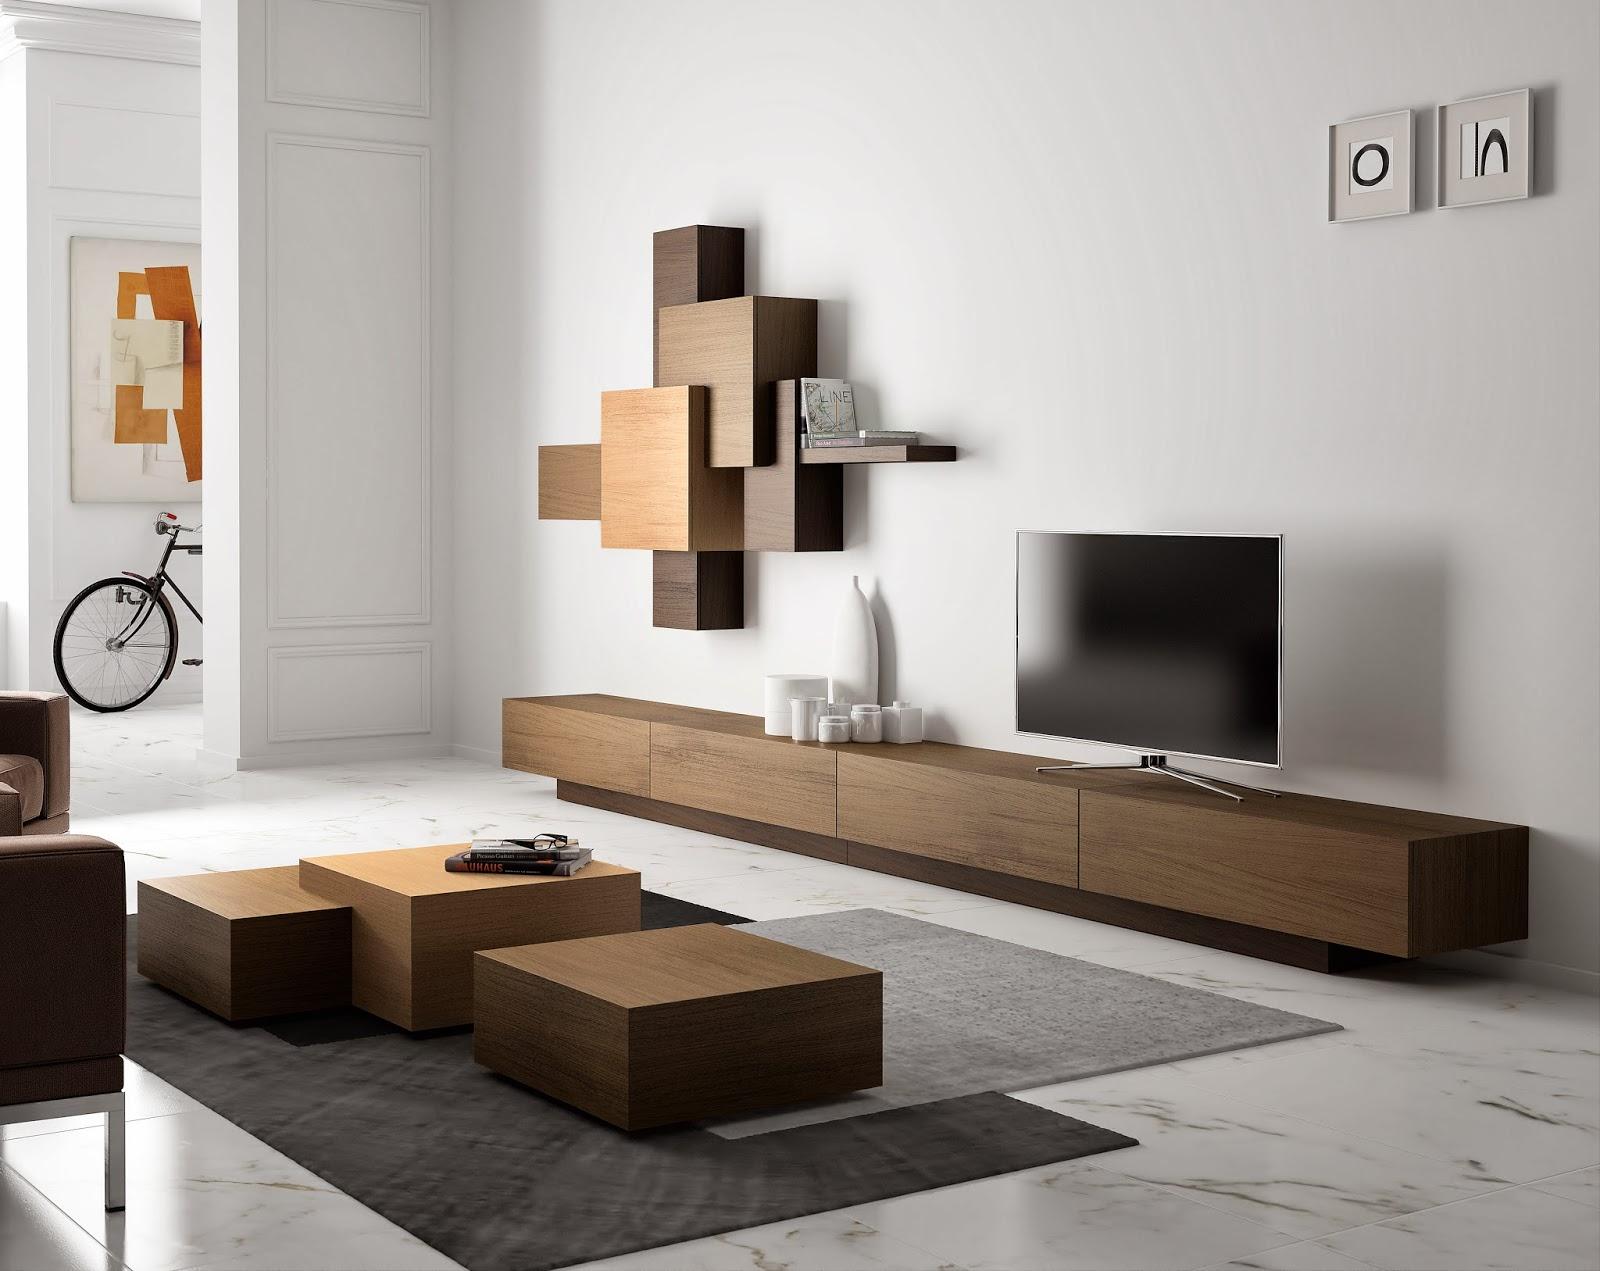 http://www.portobellostreet.es/mueble/27772/Salon-4-cajones-Moderno-Cubista